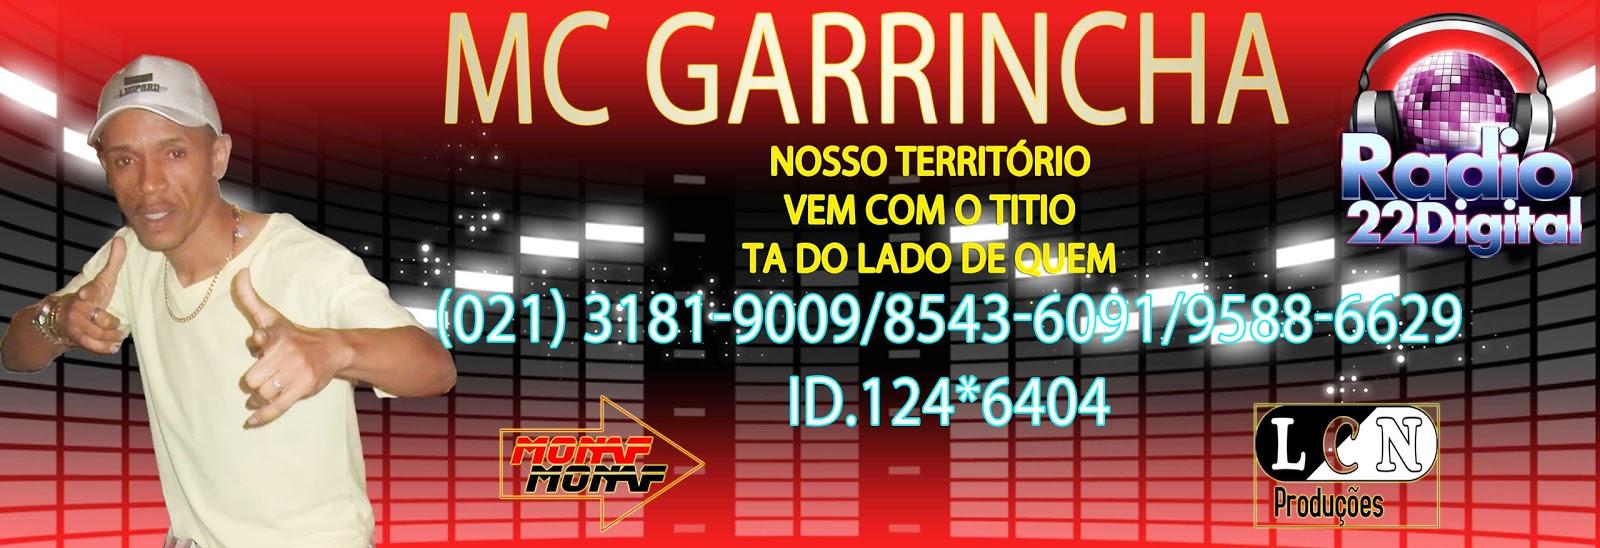 MC Garrincha